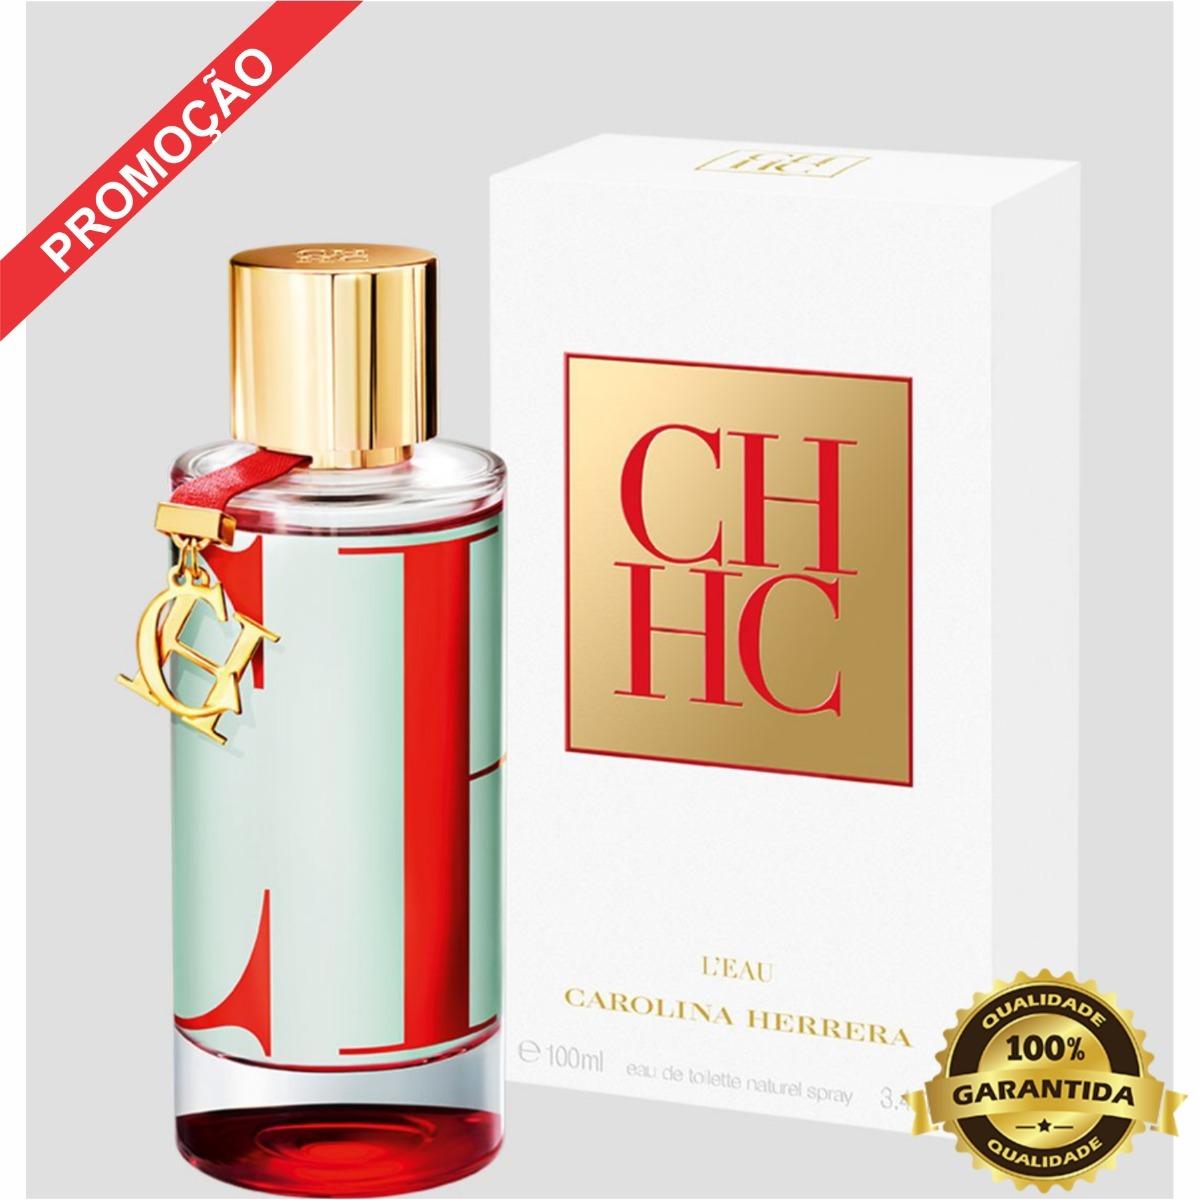 ch leau carolina herrera perfume feminino - edt - 100ml. Carregando zoom. 8e0f40f27d